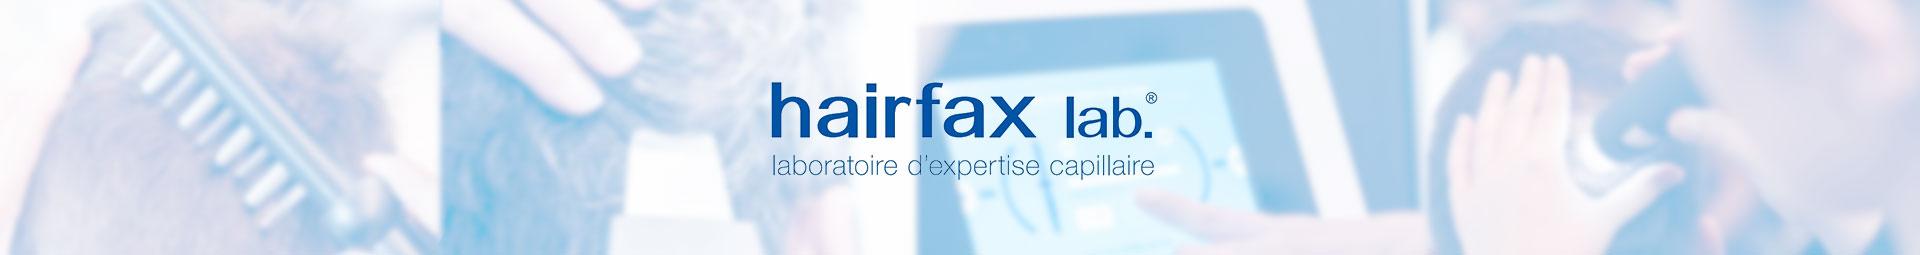 bannière hairfax lab